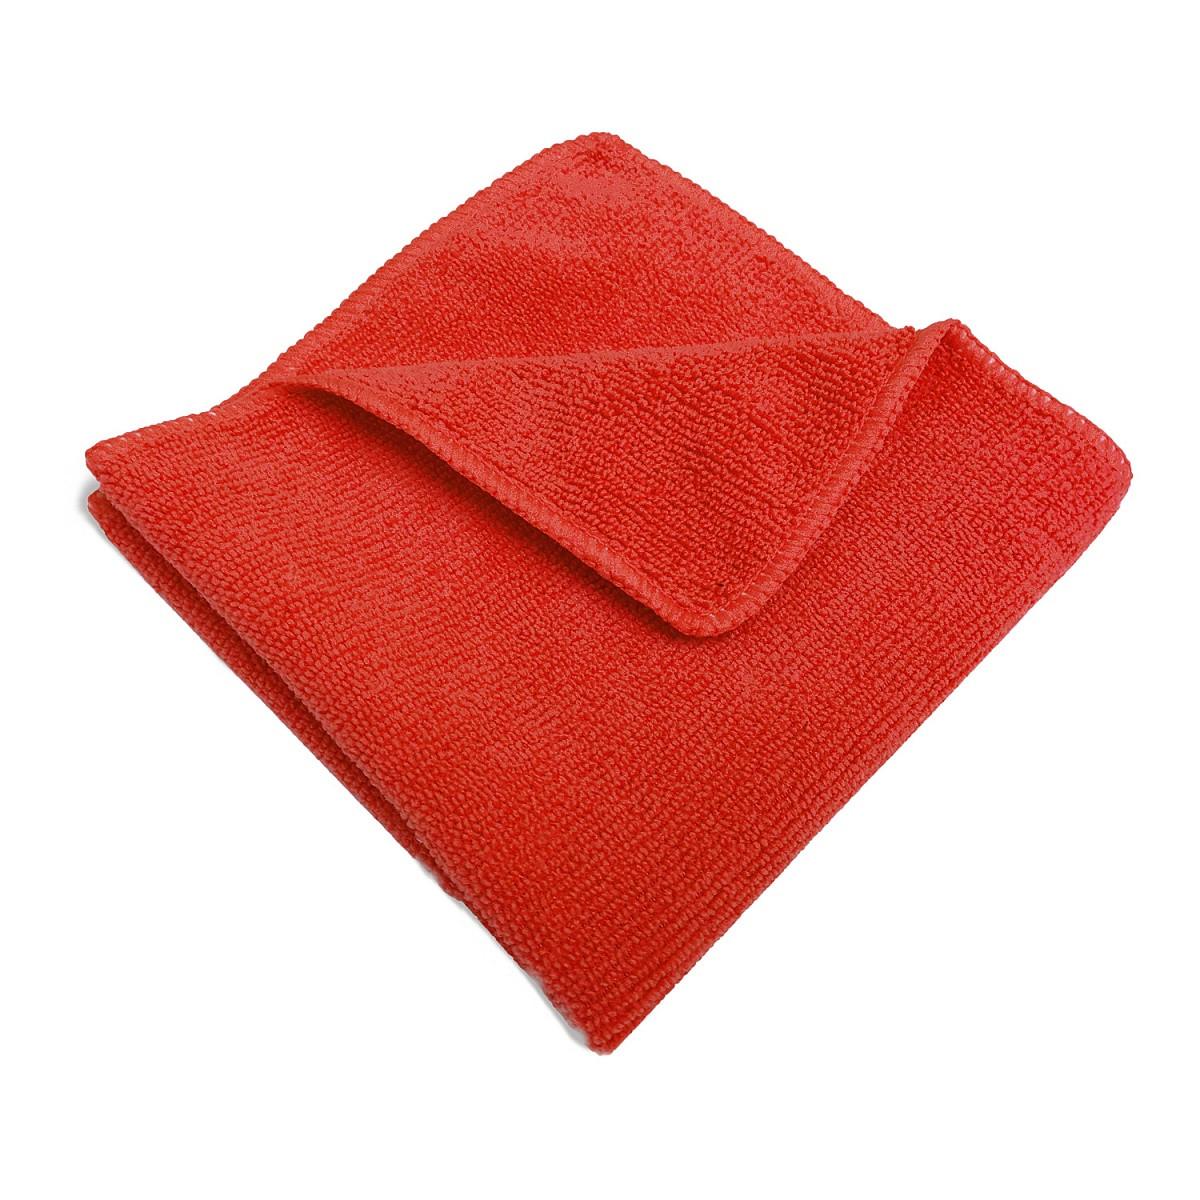 Салфетка микрофибра 220 г/м 30*30 (300 шт) короб красная